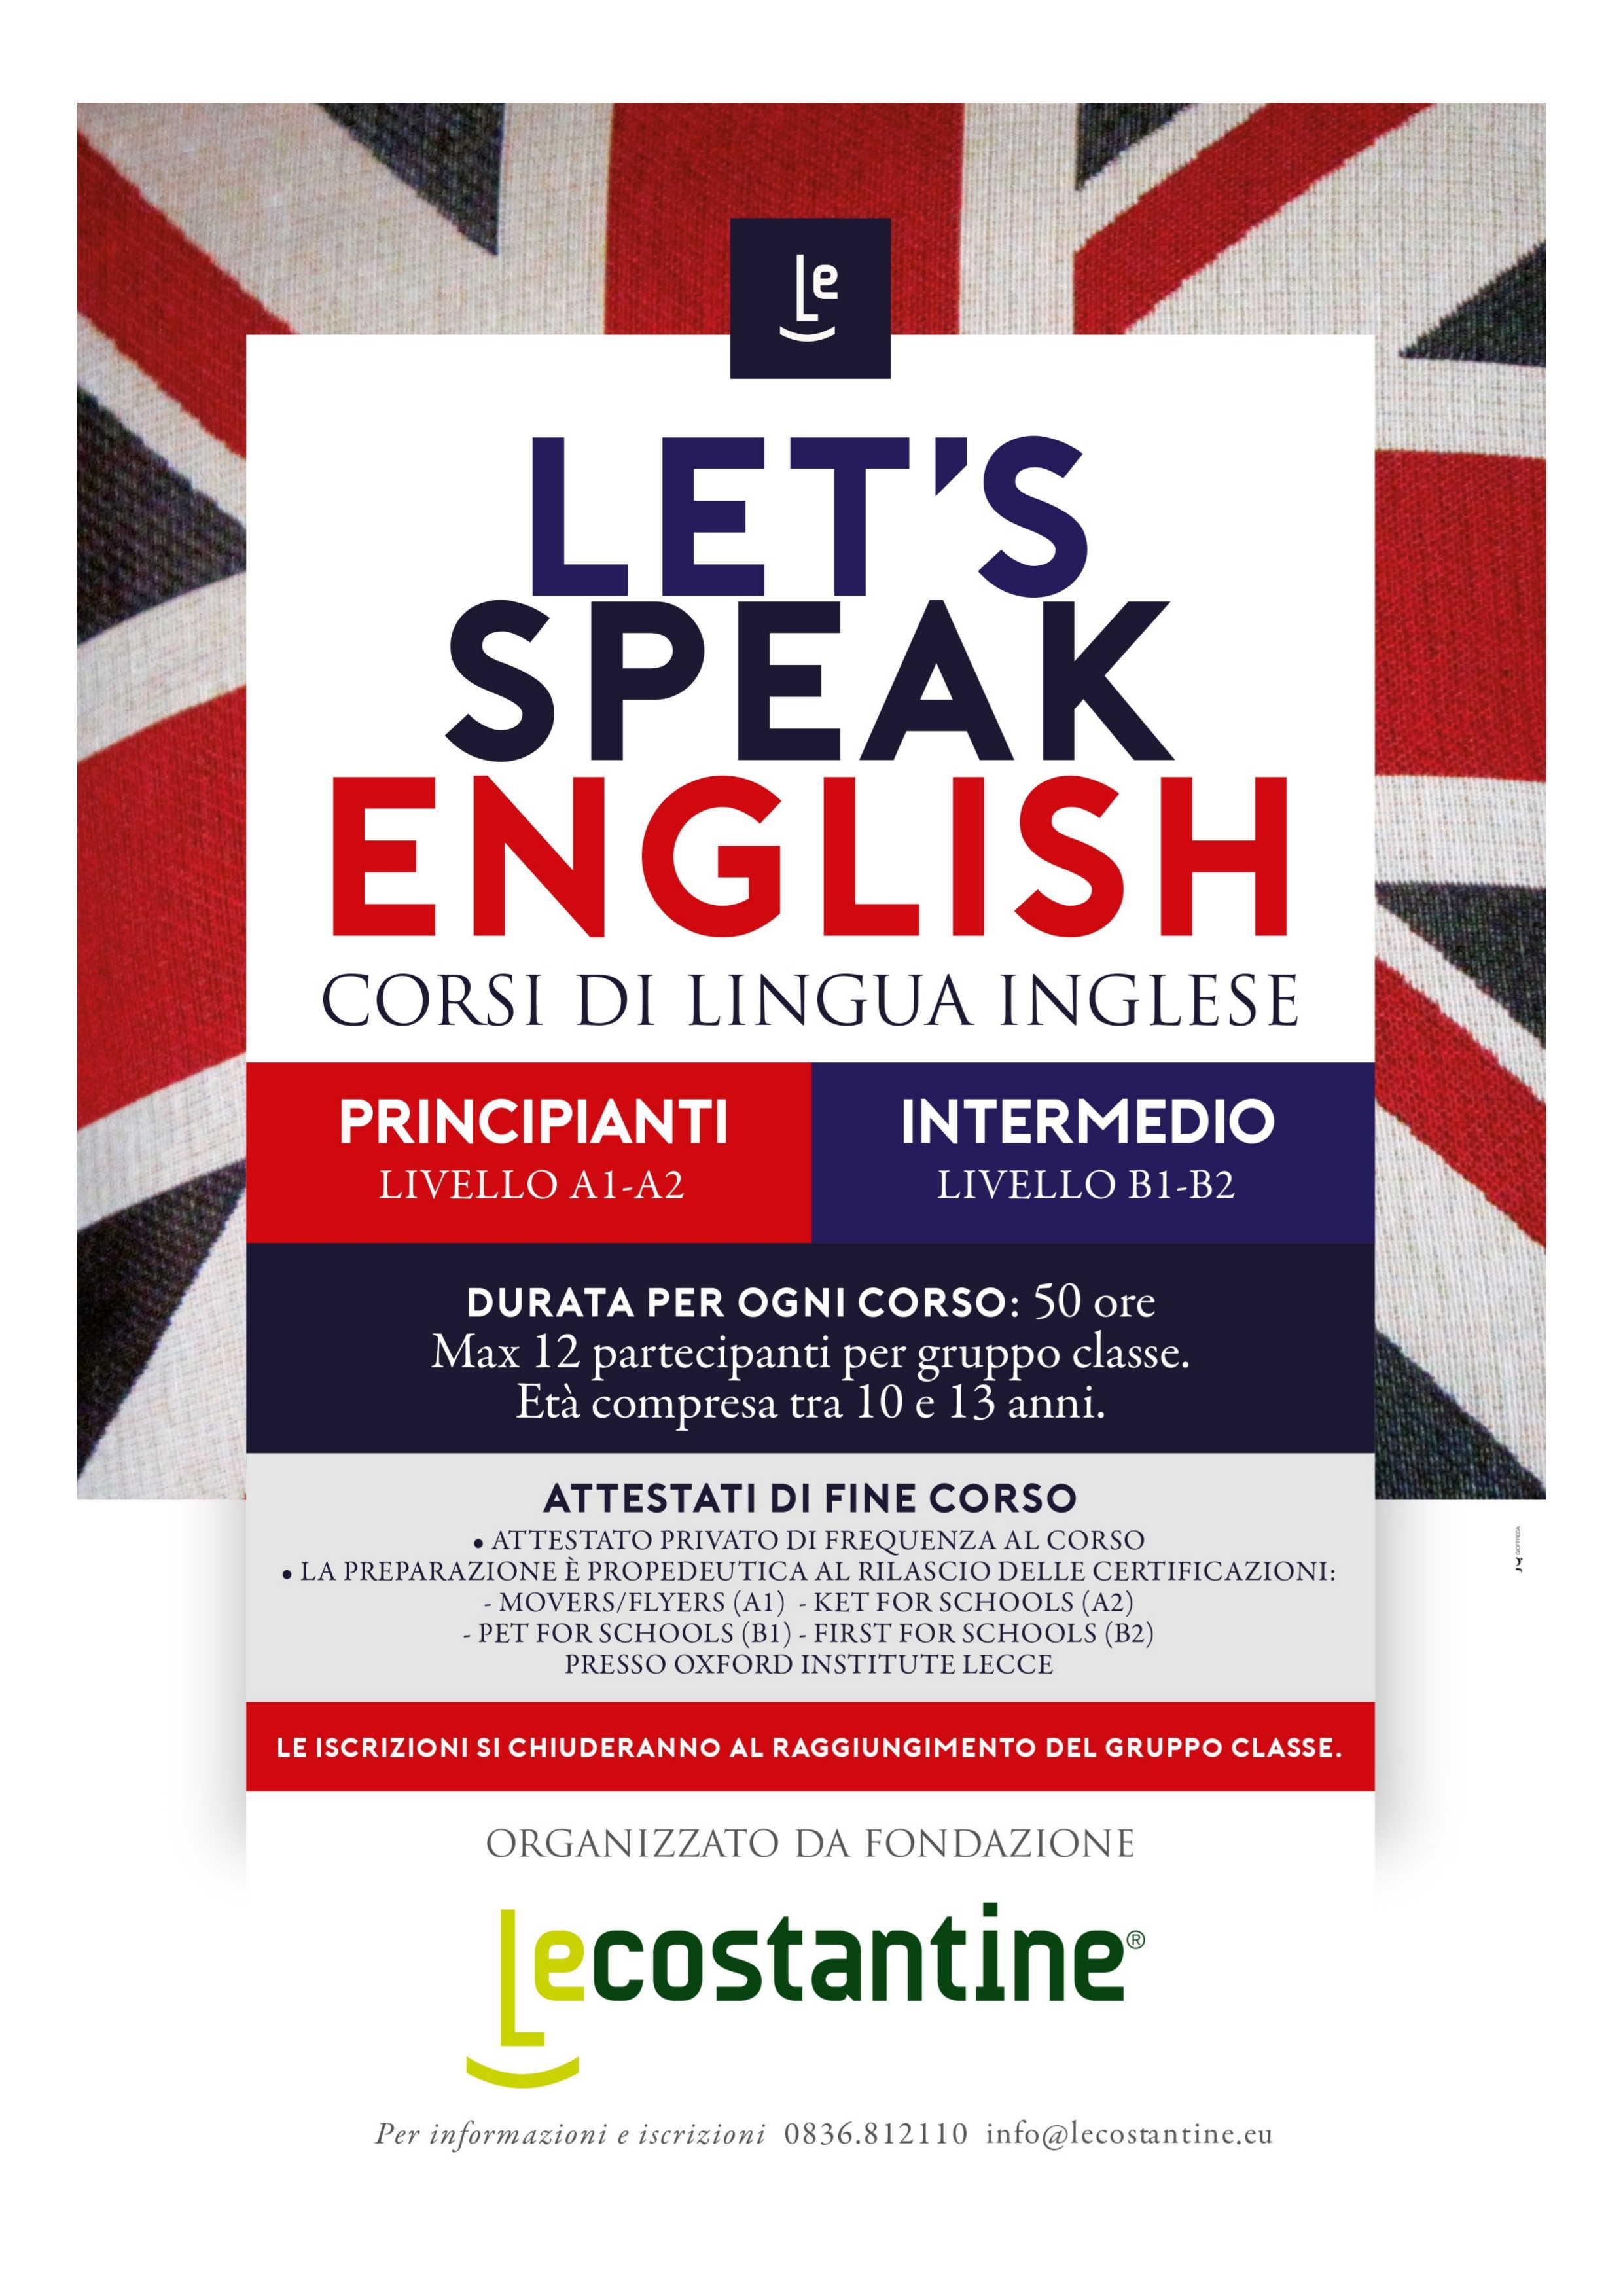 Let's Speak English CORSO INGLESE.jpg